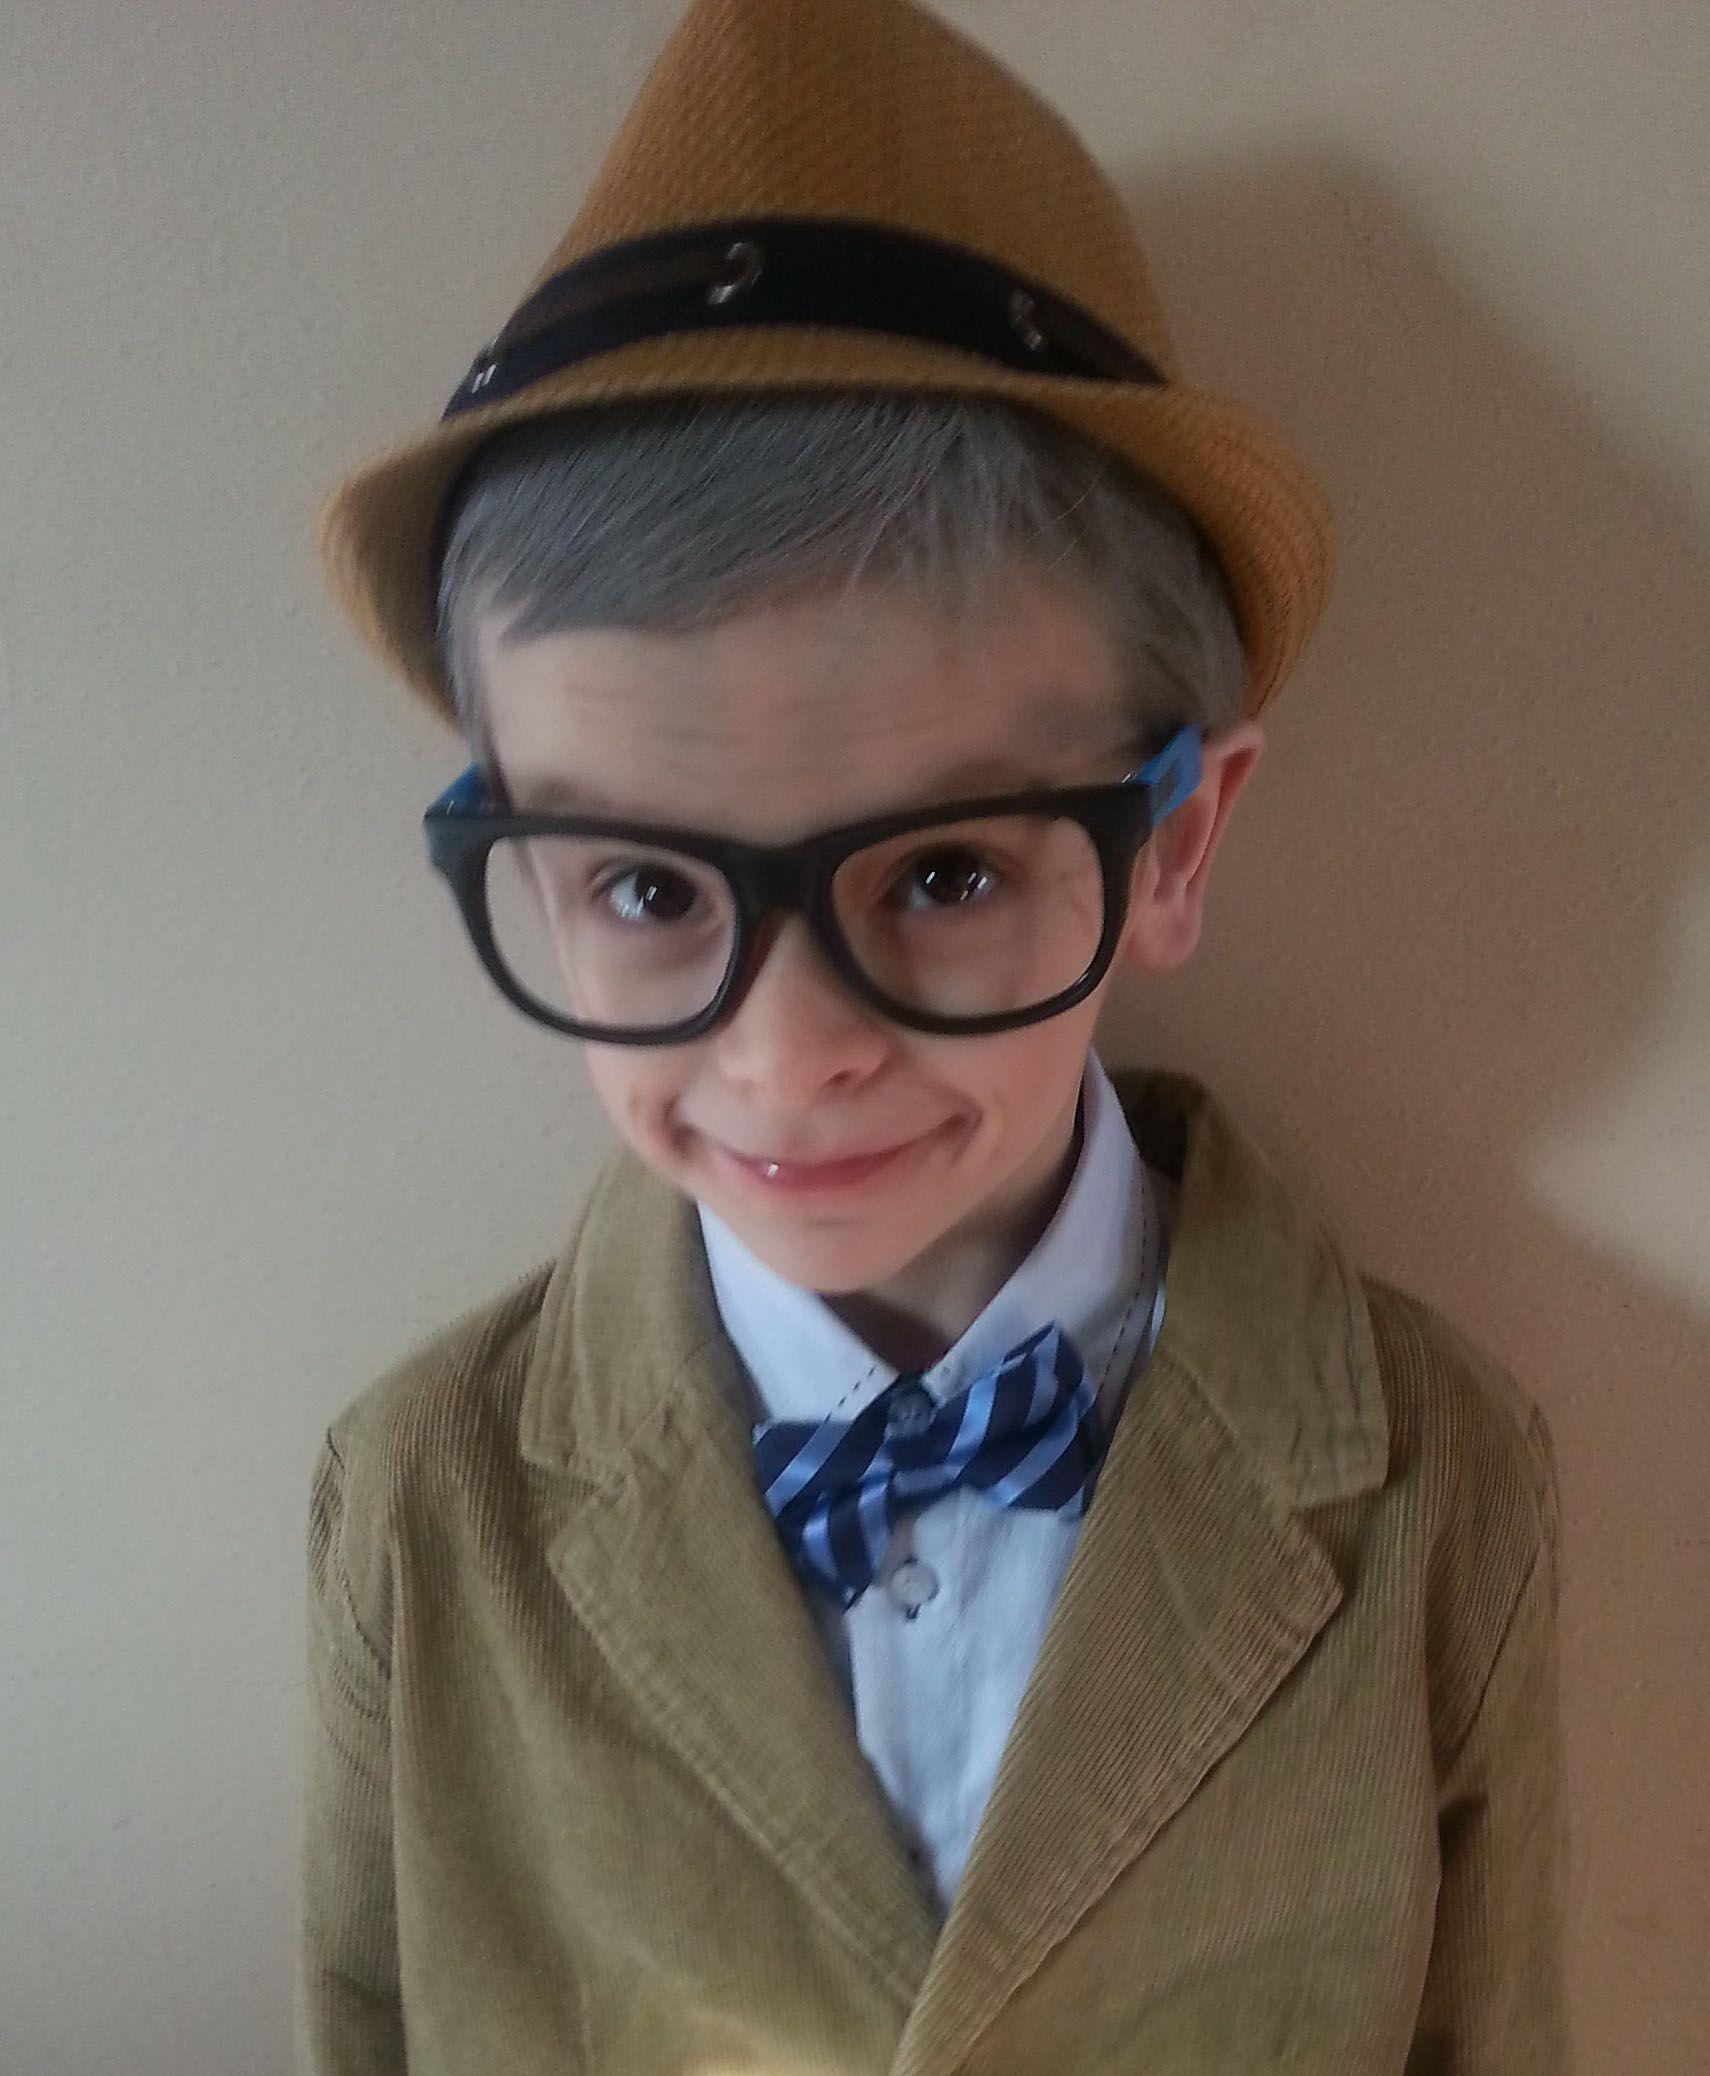 6yo dressed as a 99yo. From Reddit.com